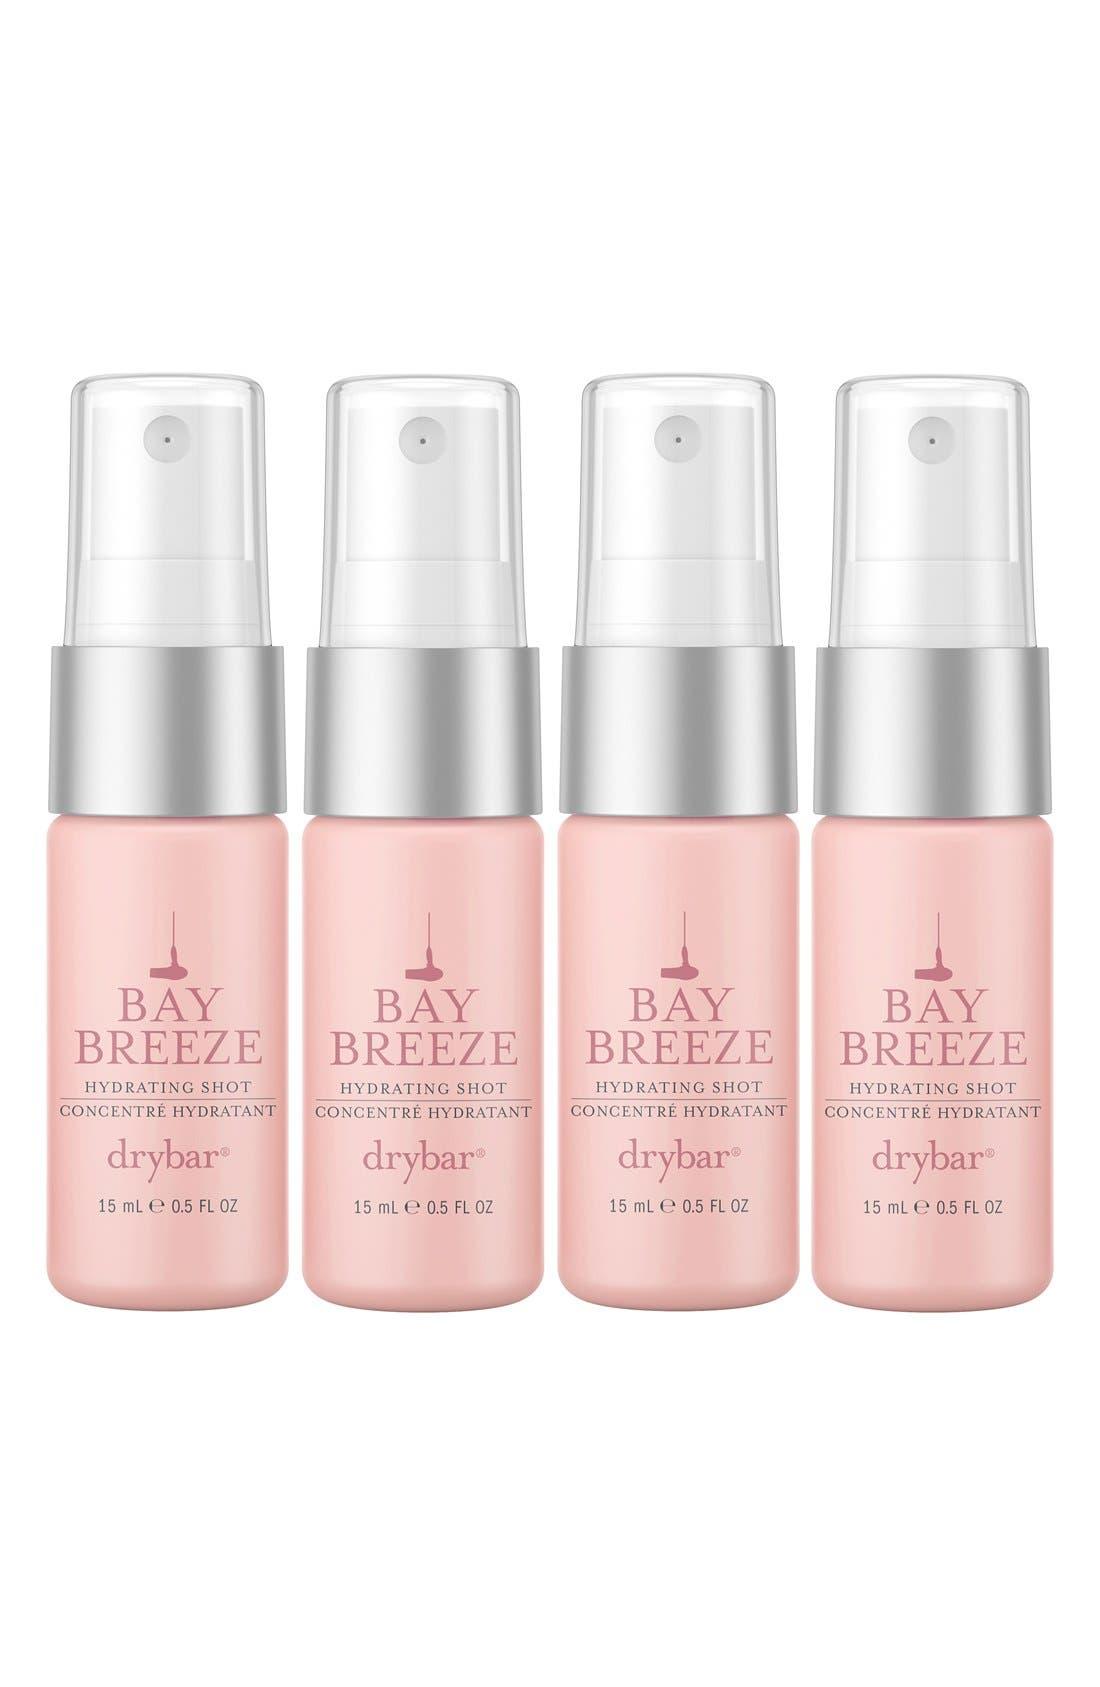 DRYBAR Bay Breeze Set of 4 Hydrating Shots, Main, color, NO COLOR